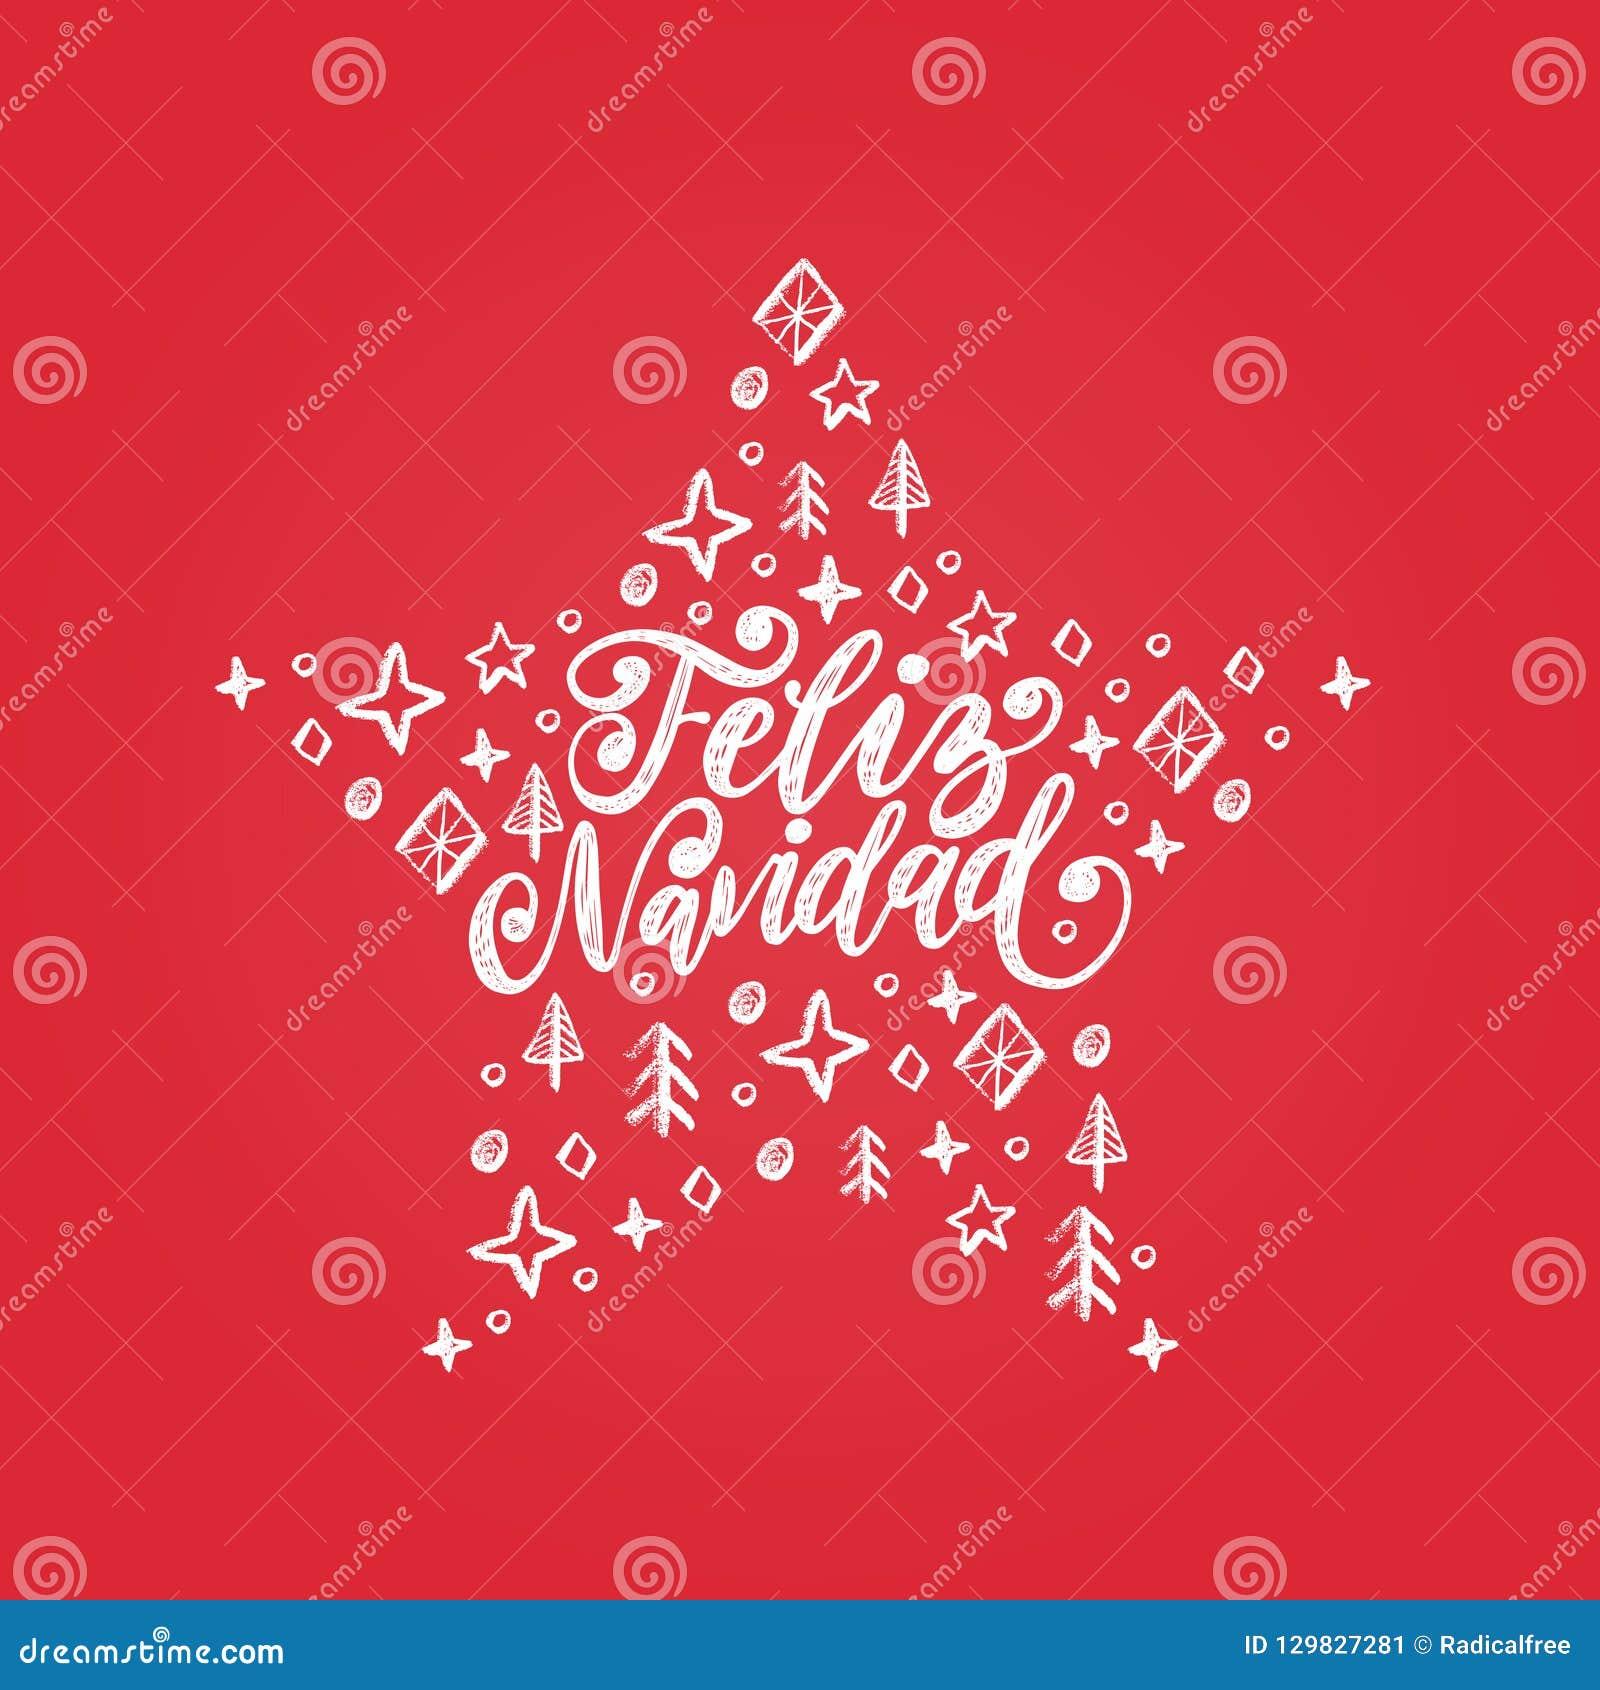 Frasi Per Buon Natale.Feliz Navidad Frase Scritta A Mano Tradotta Dal Buon